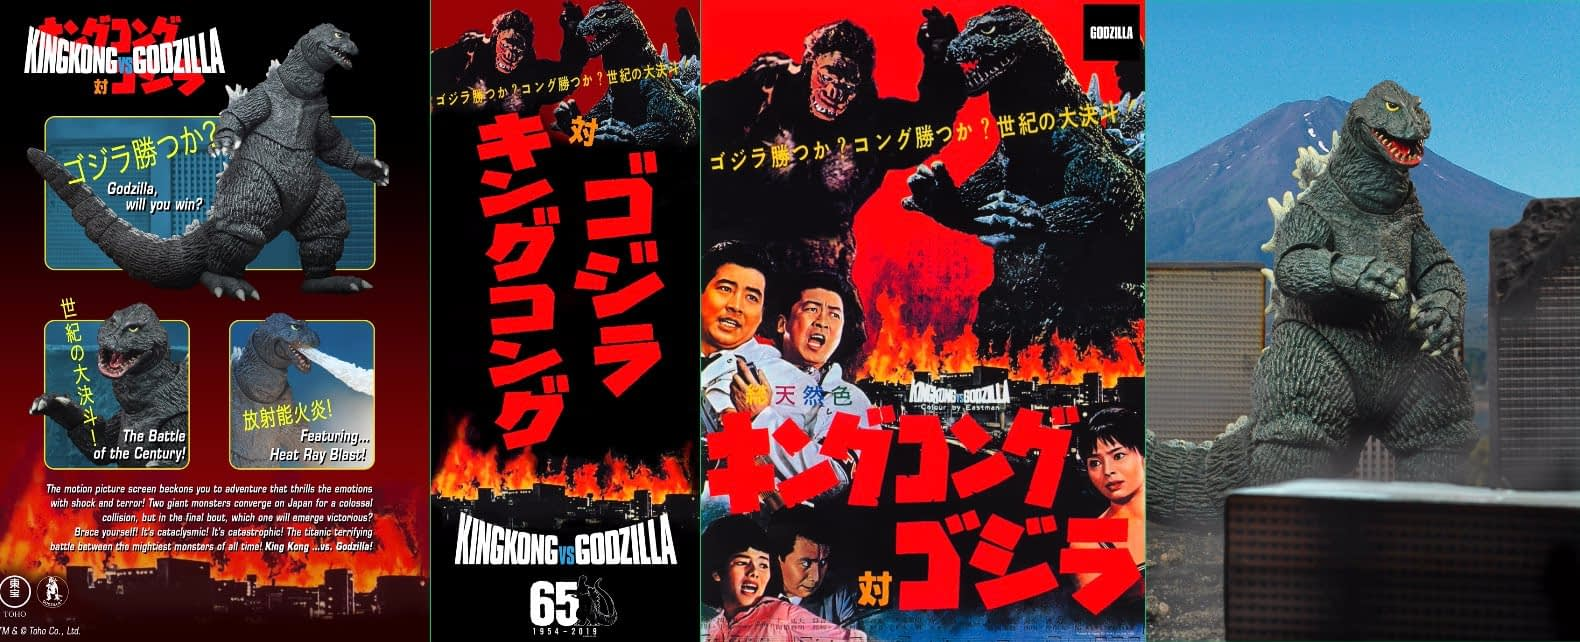 NECA Godzilla 1962 Package